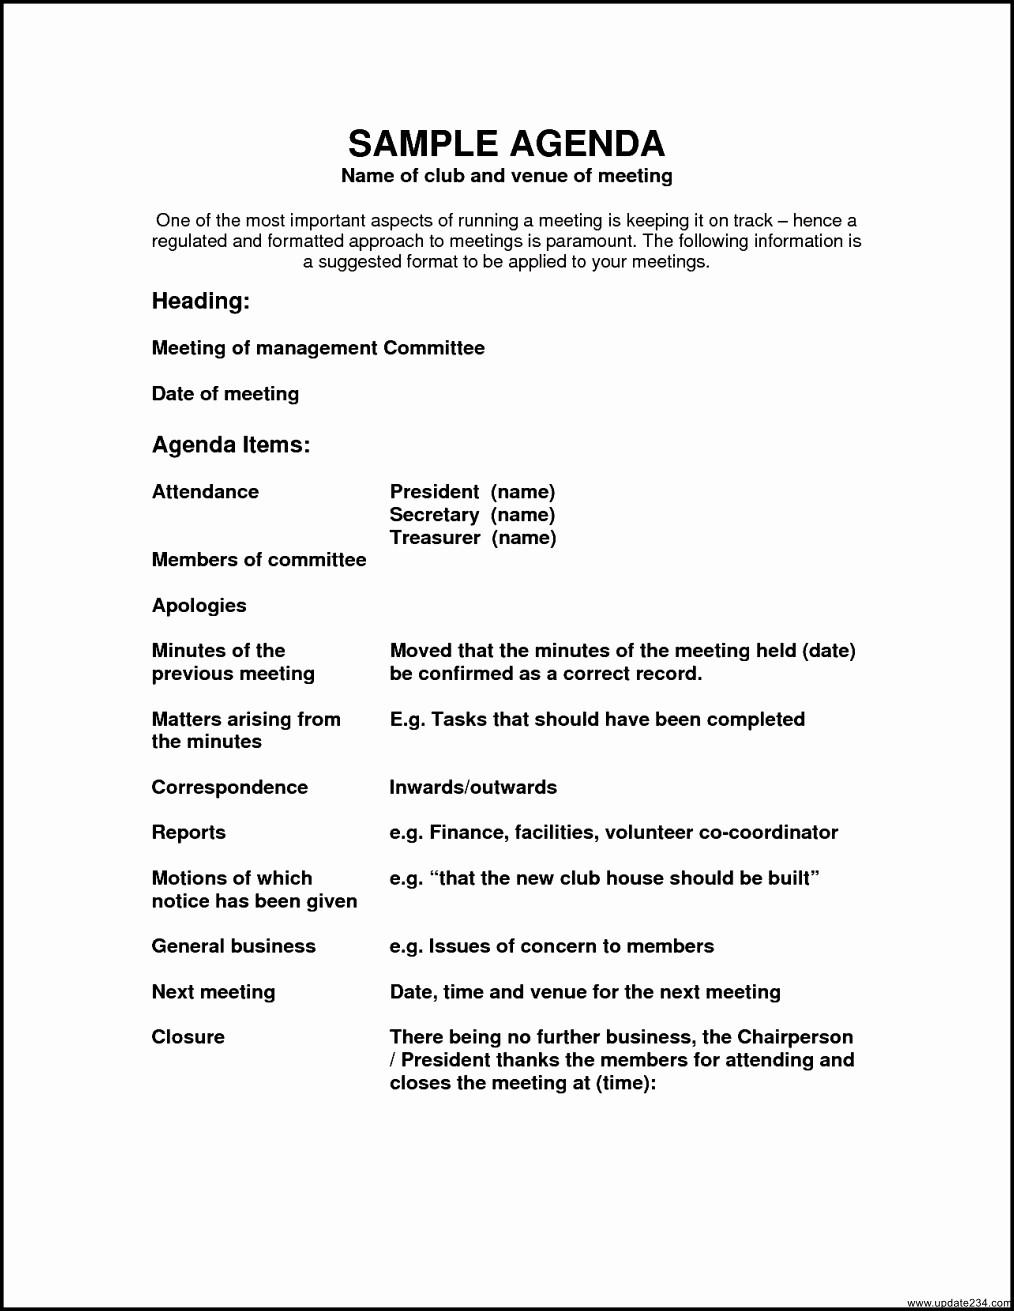 Sample Agenda Template for Meetings New Sample Agenda Template Template Update234 Template